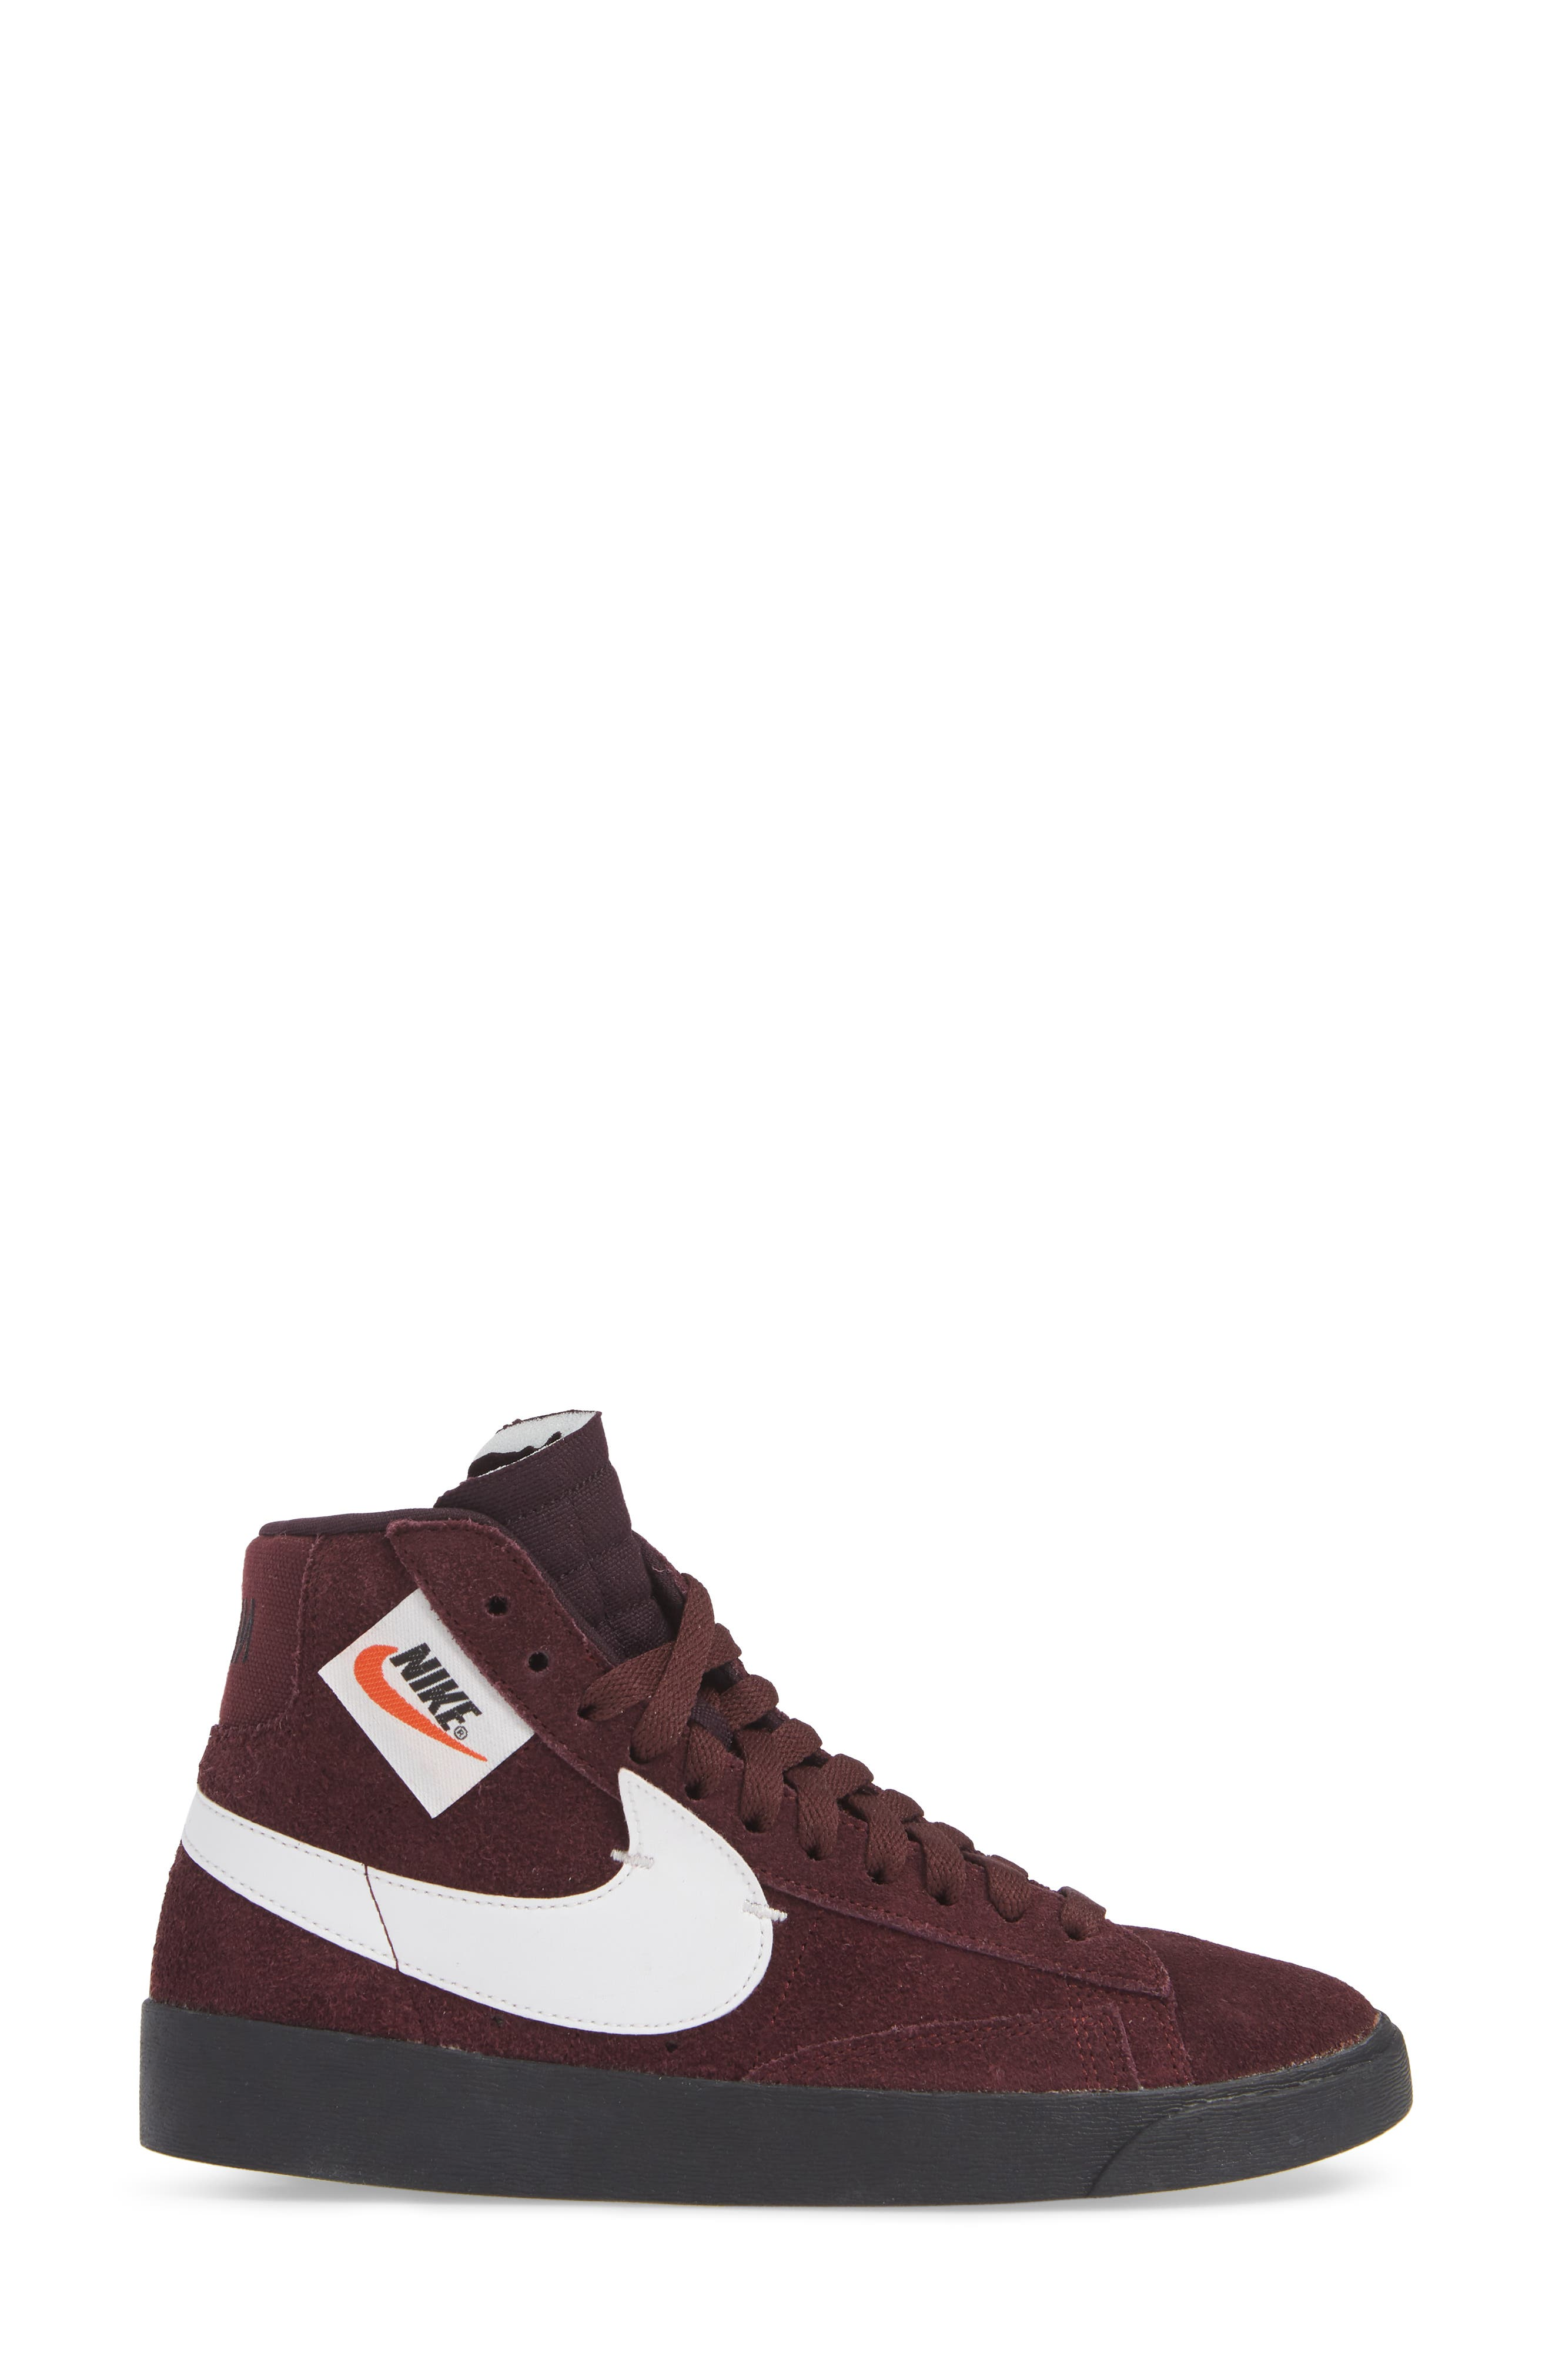 NIKE, Blazer Mid Rebel Sneaker, Alternate thumbnail 3, color, 930